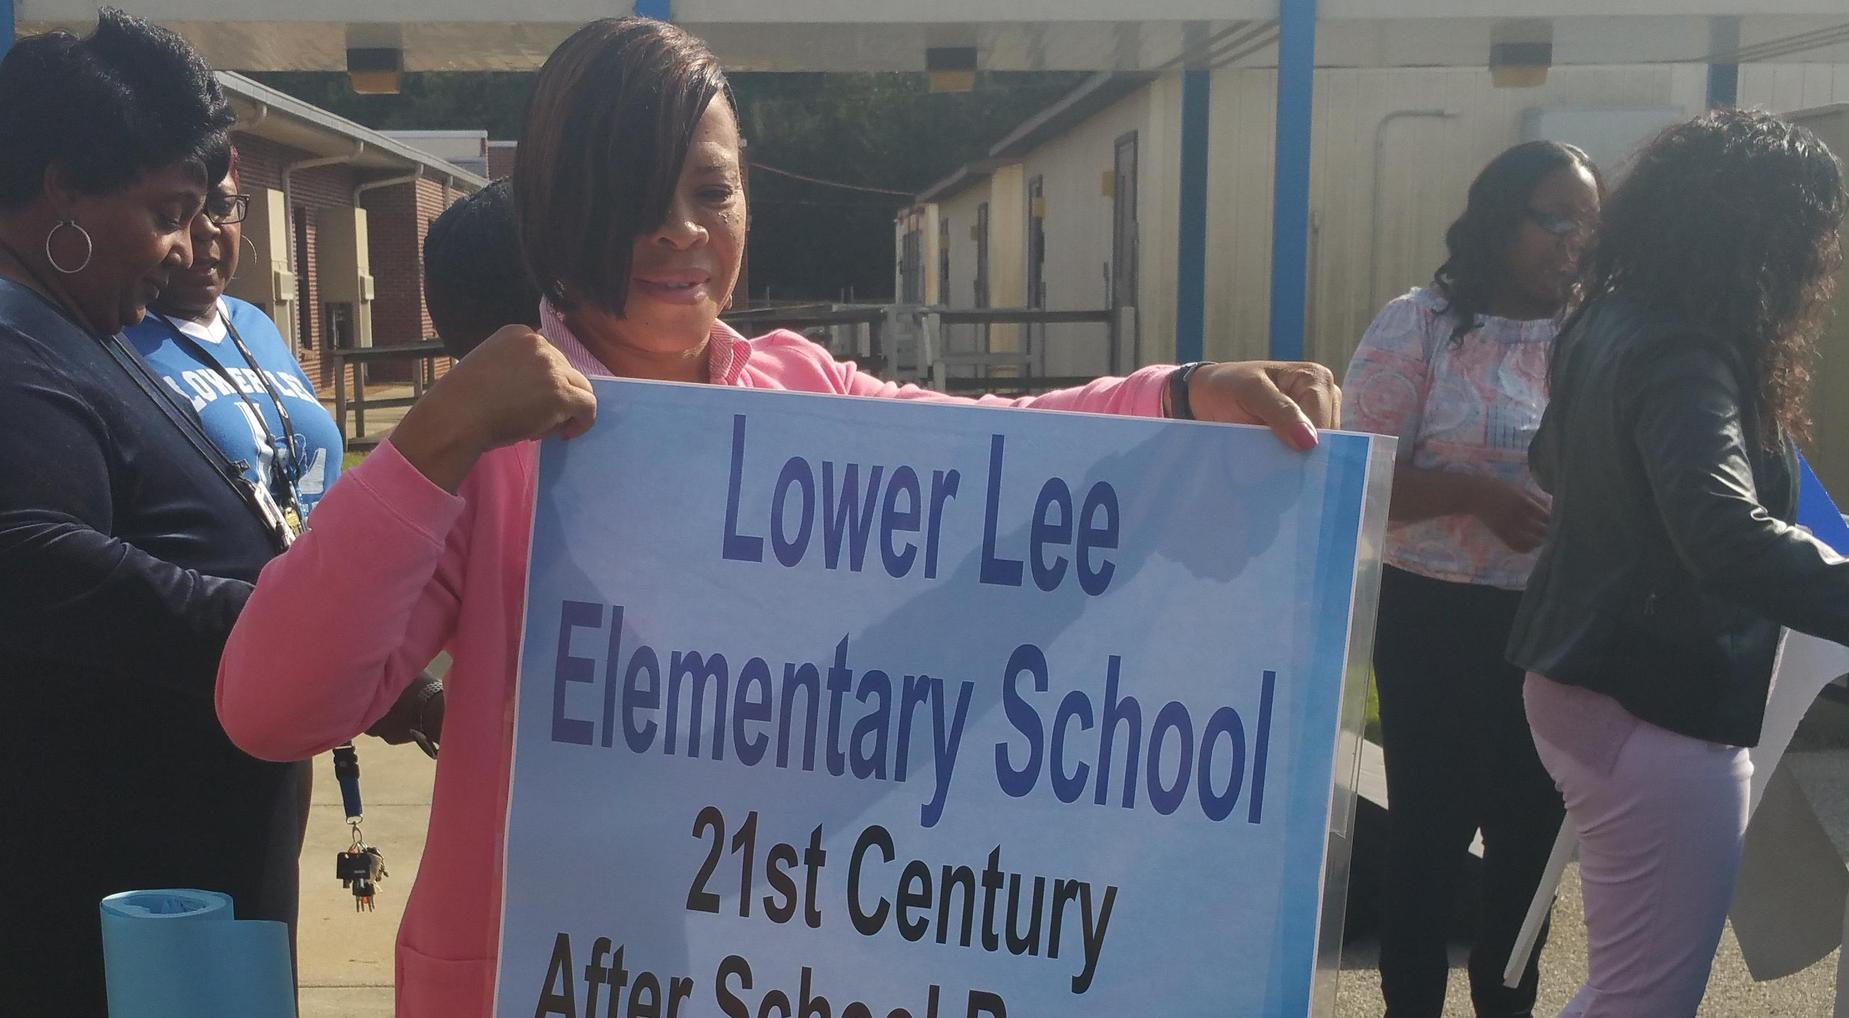 Lower Lee Elementary school event